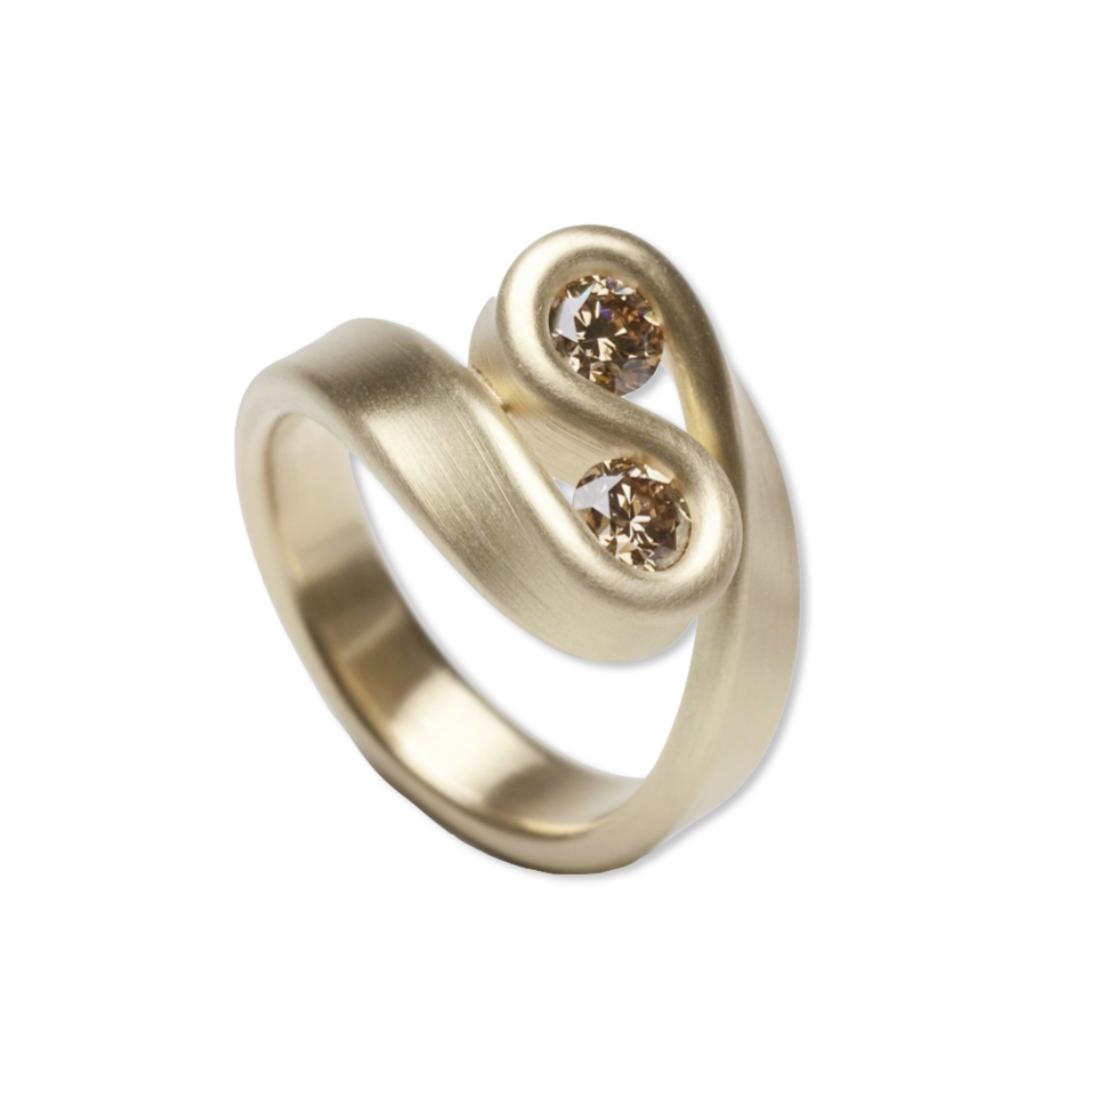 Leen Heyne - Gold & Diamond Duett Ring - Edelgedacht Gent - De Pinte